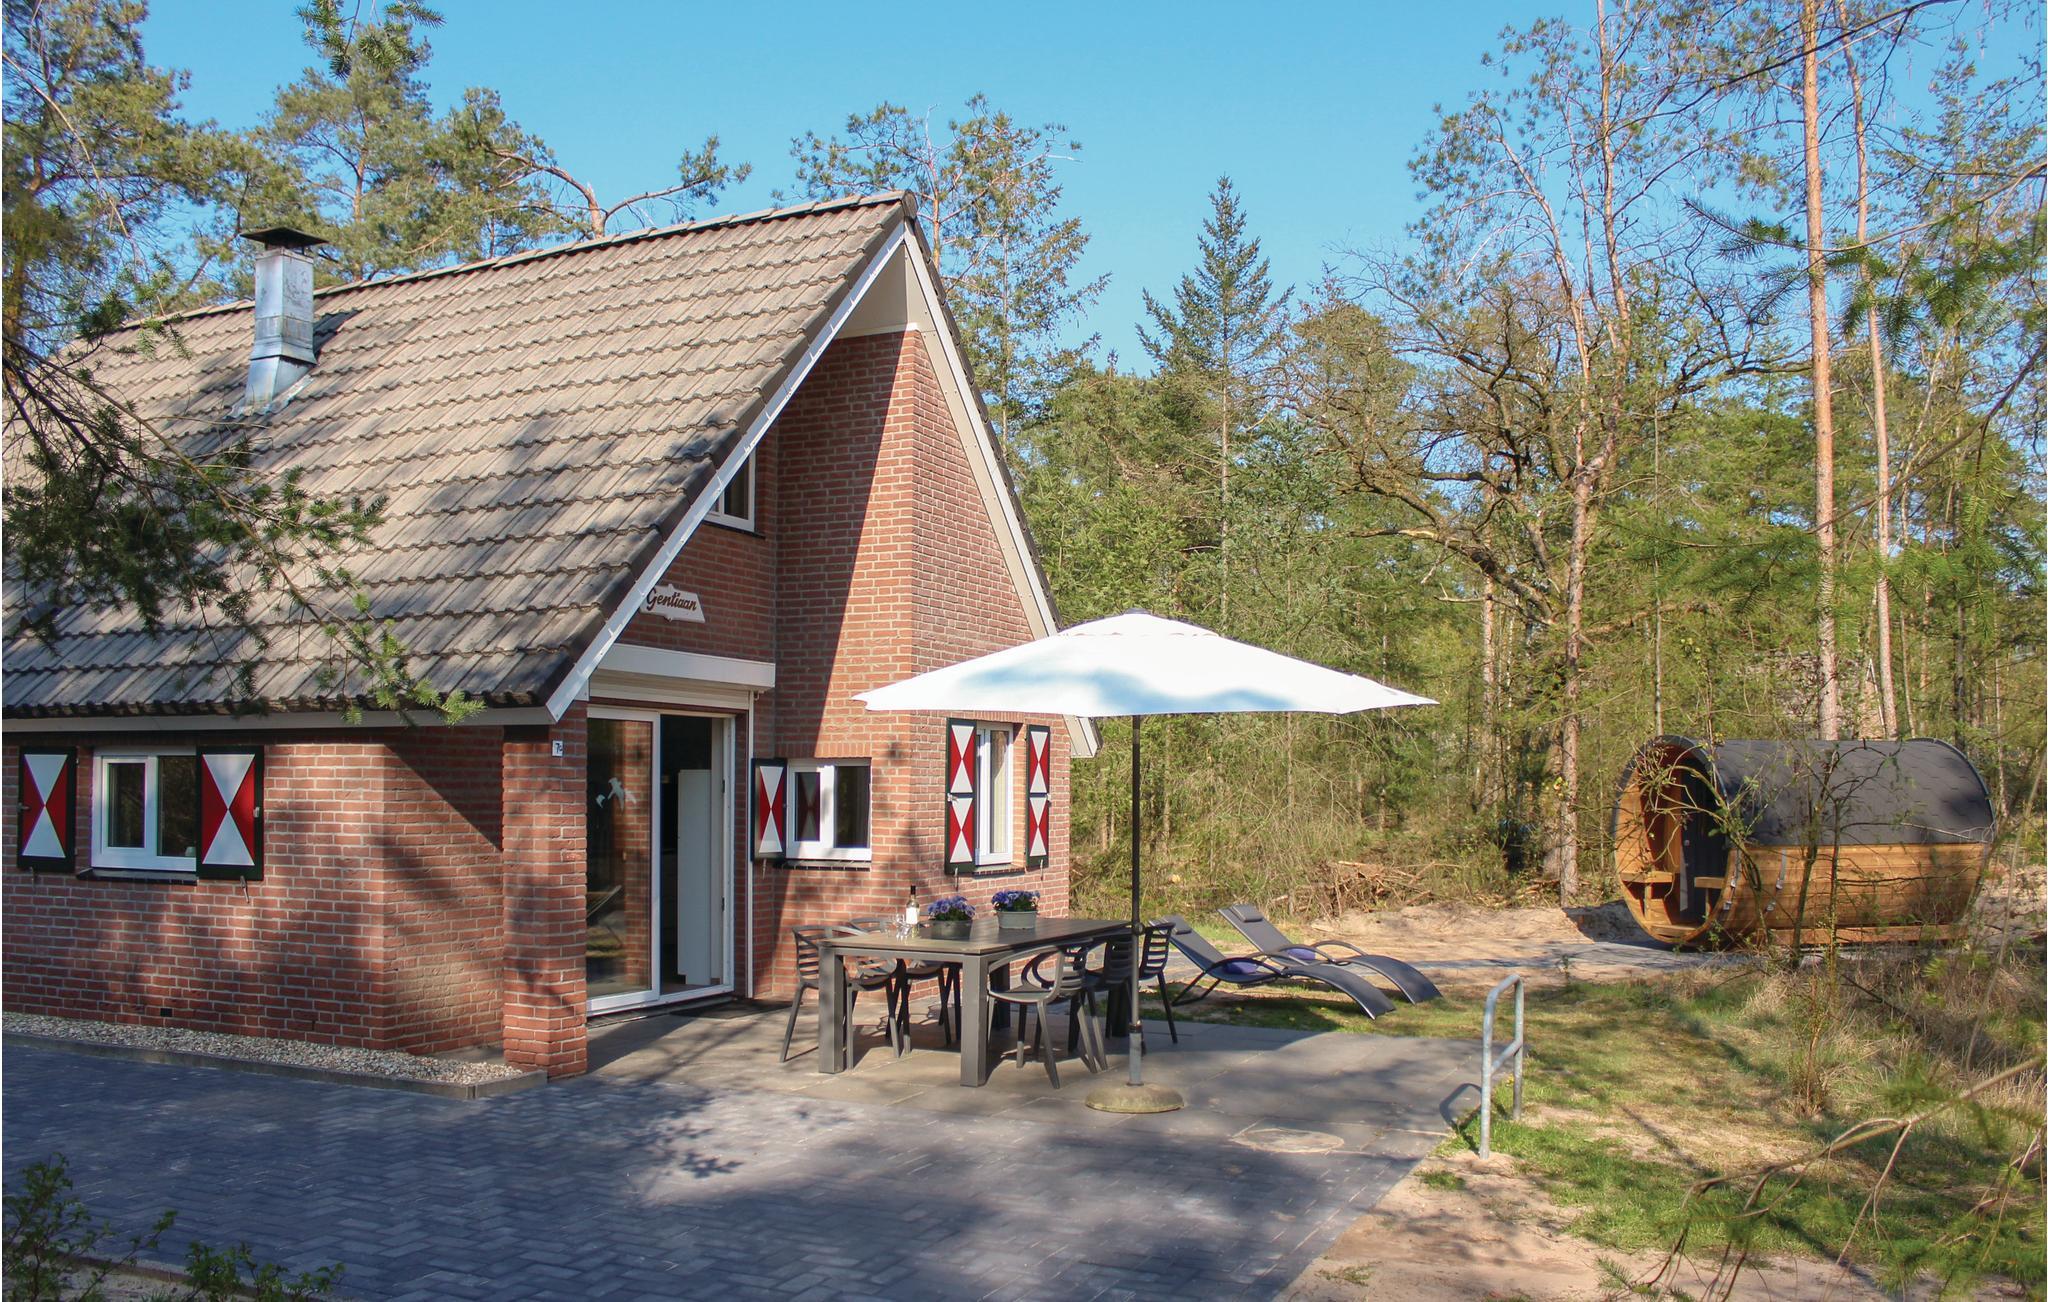 TOP DEAL vakantiepark Vechtdal 🏕️Novasol Bospark Landgoed Junne